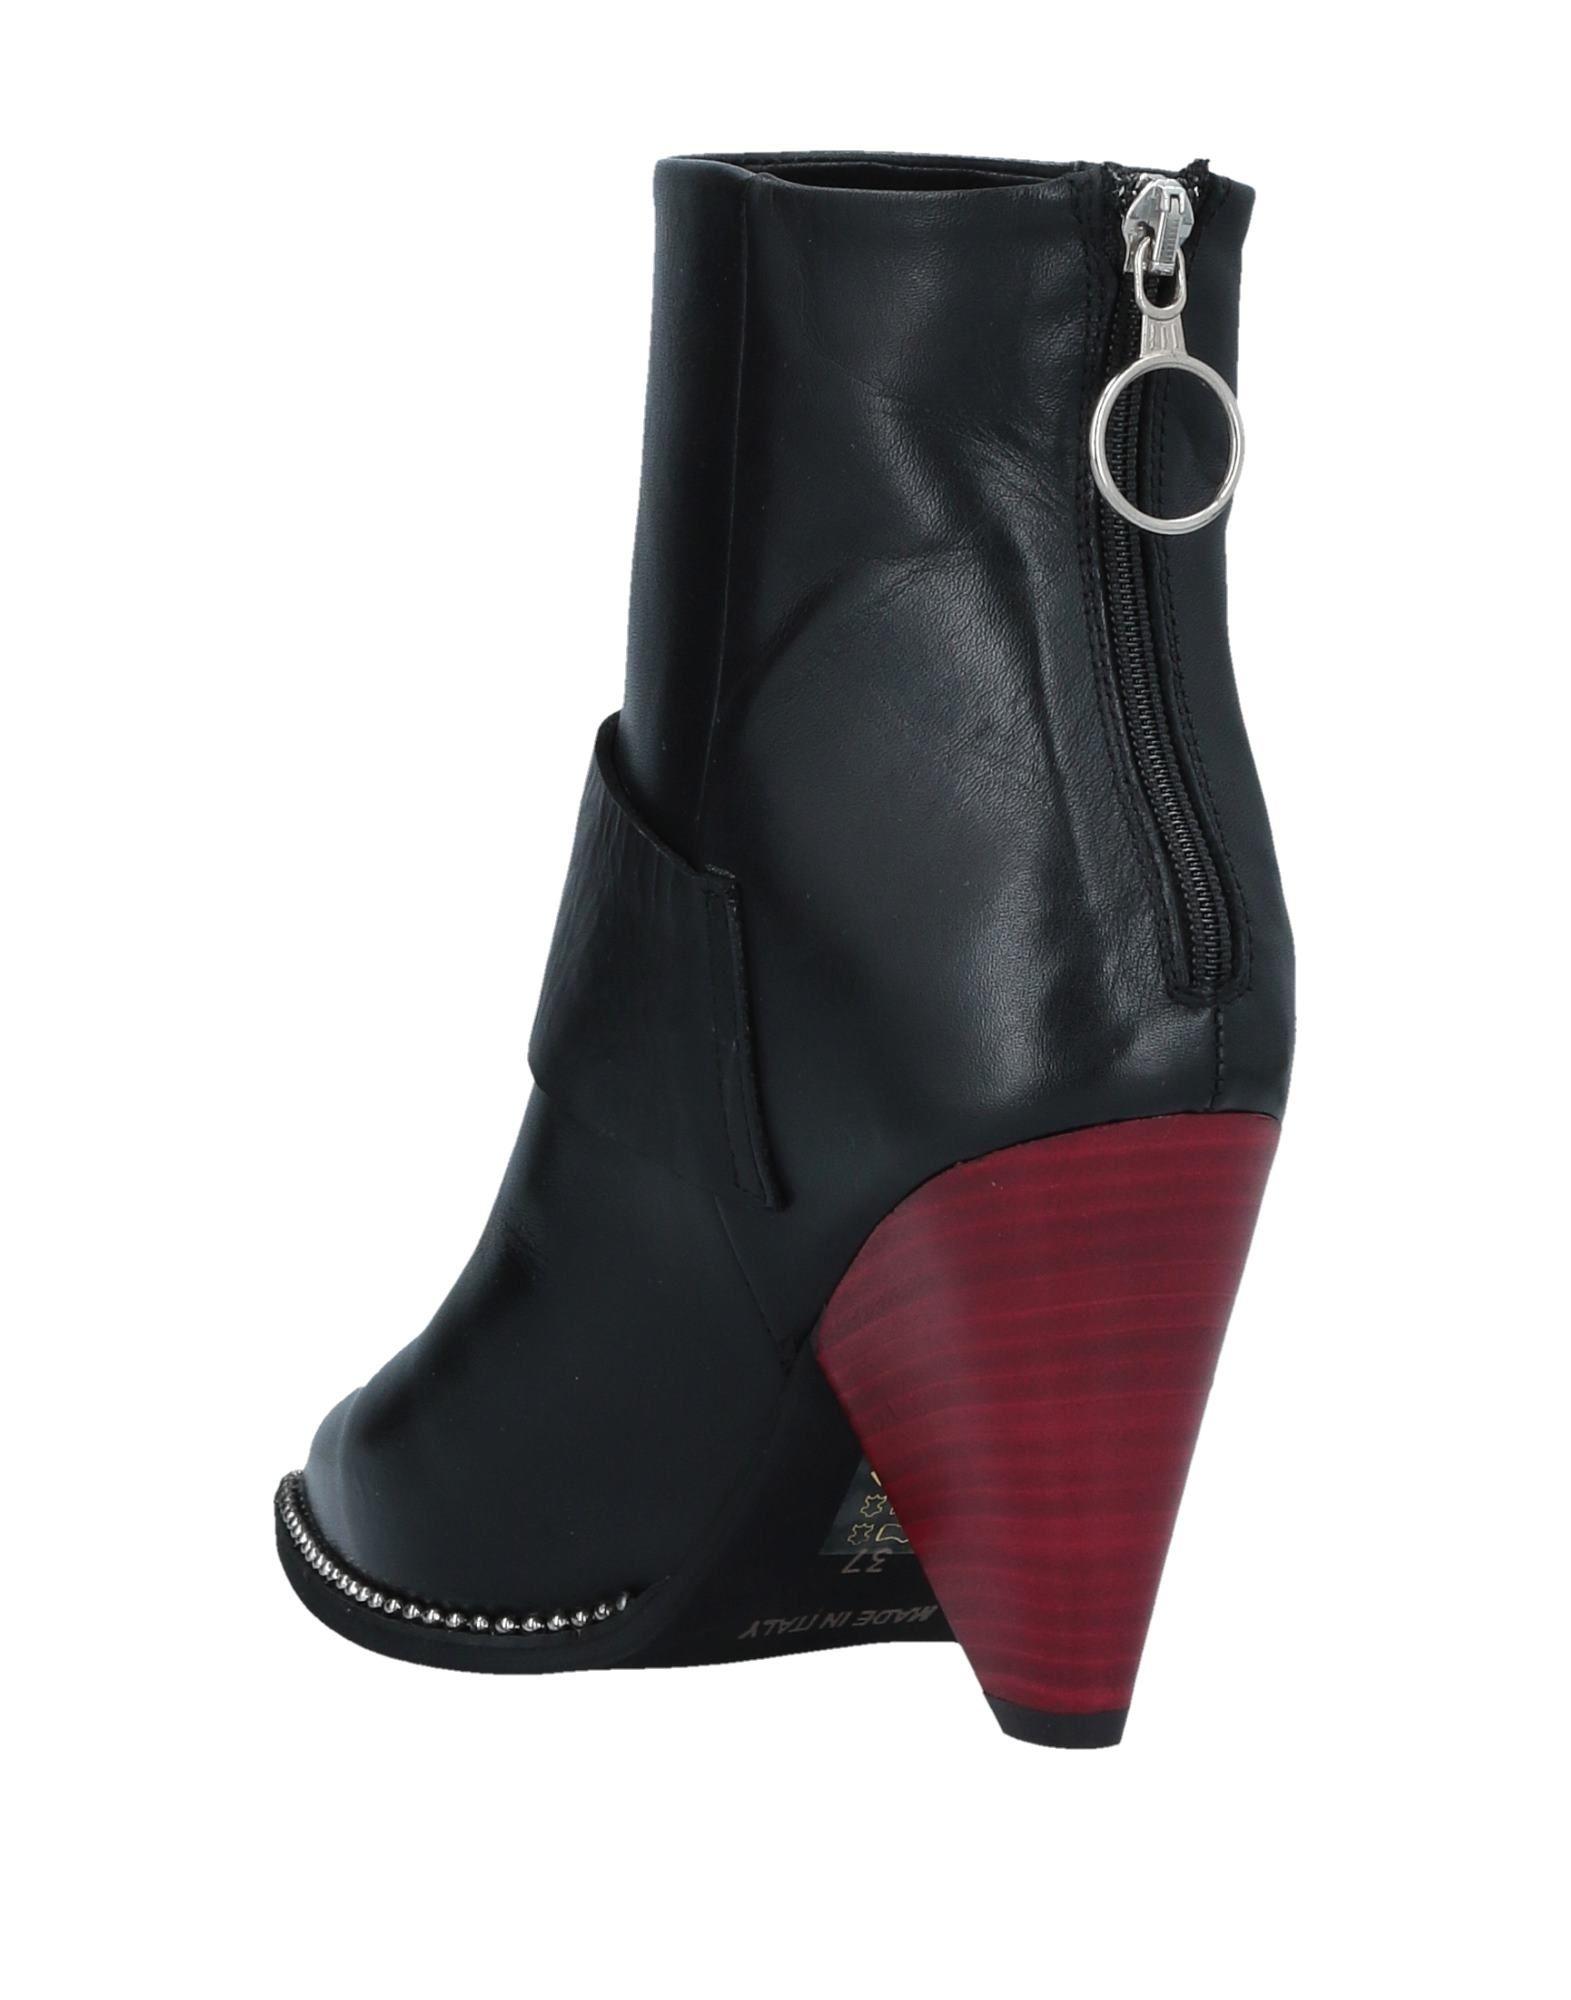 Stilvolle Pepite billige Schuhe Le Pepite Stilvolle Stiefelette Damen  11528358GT a7b4fb